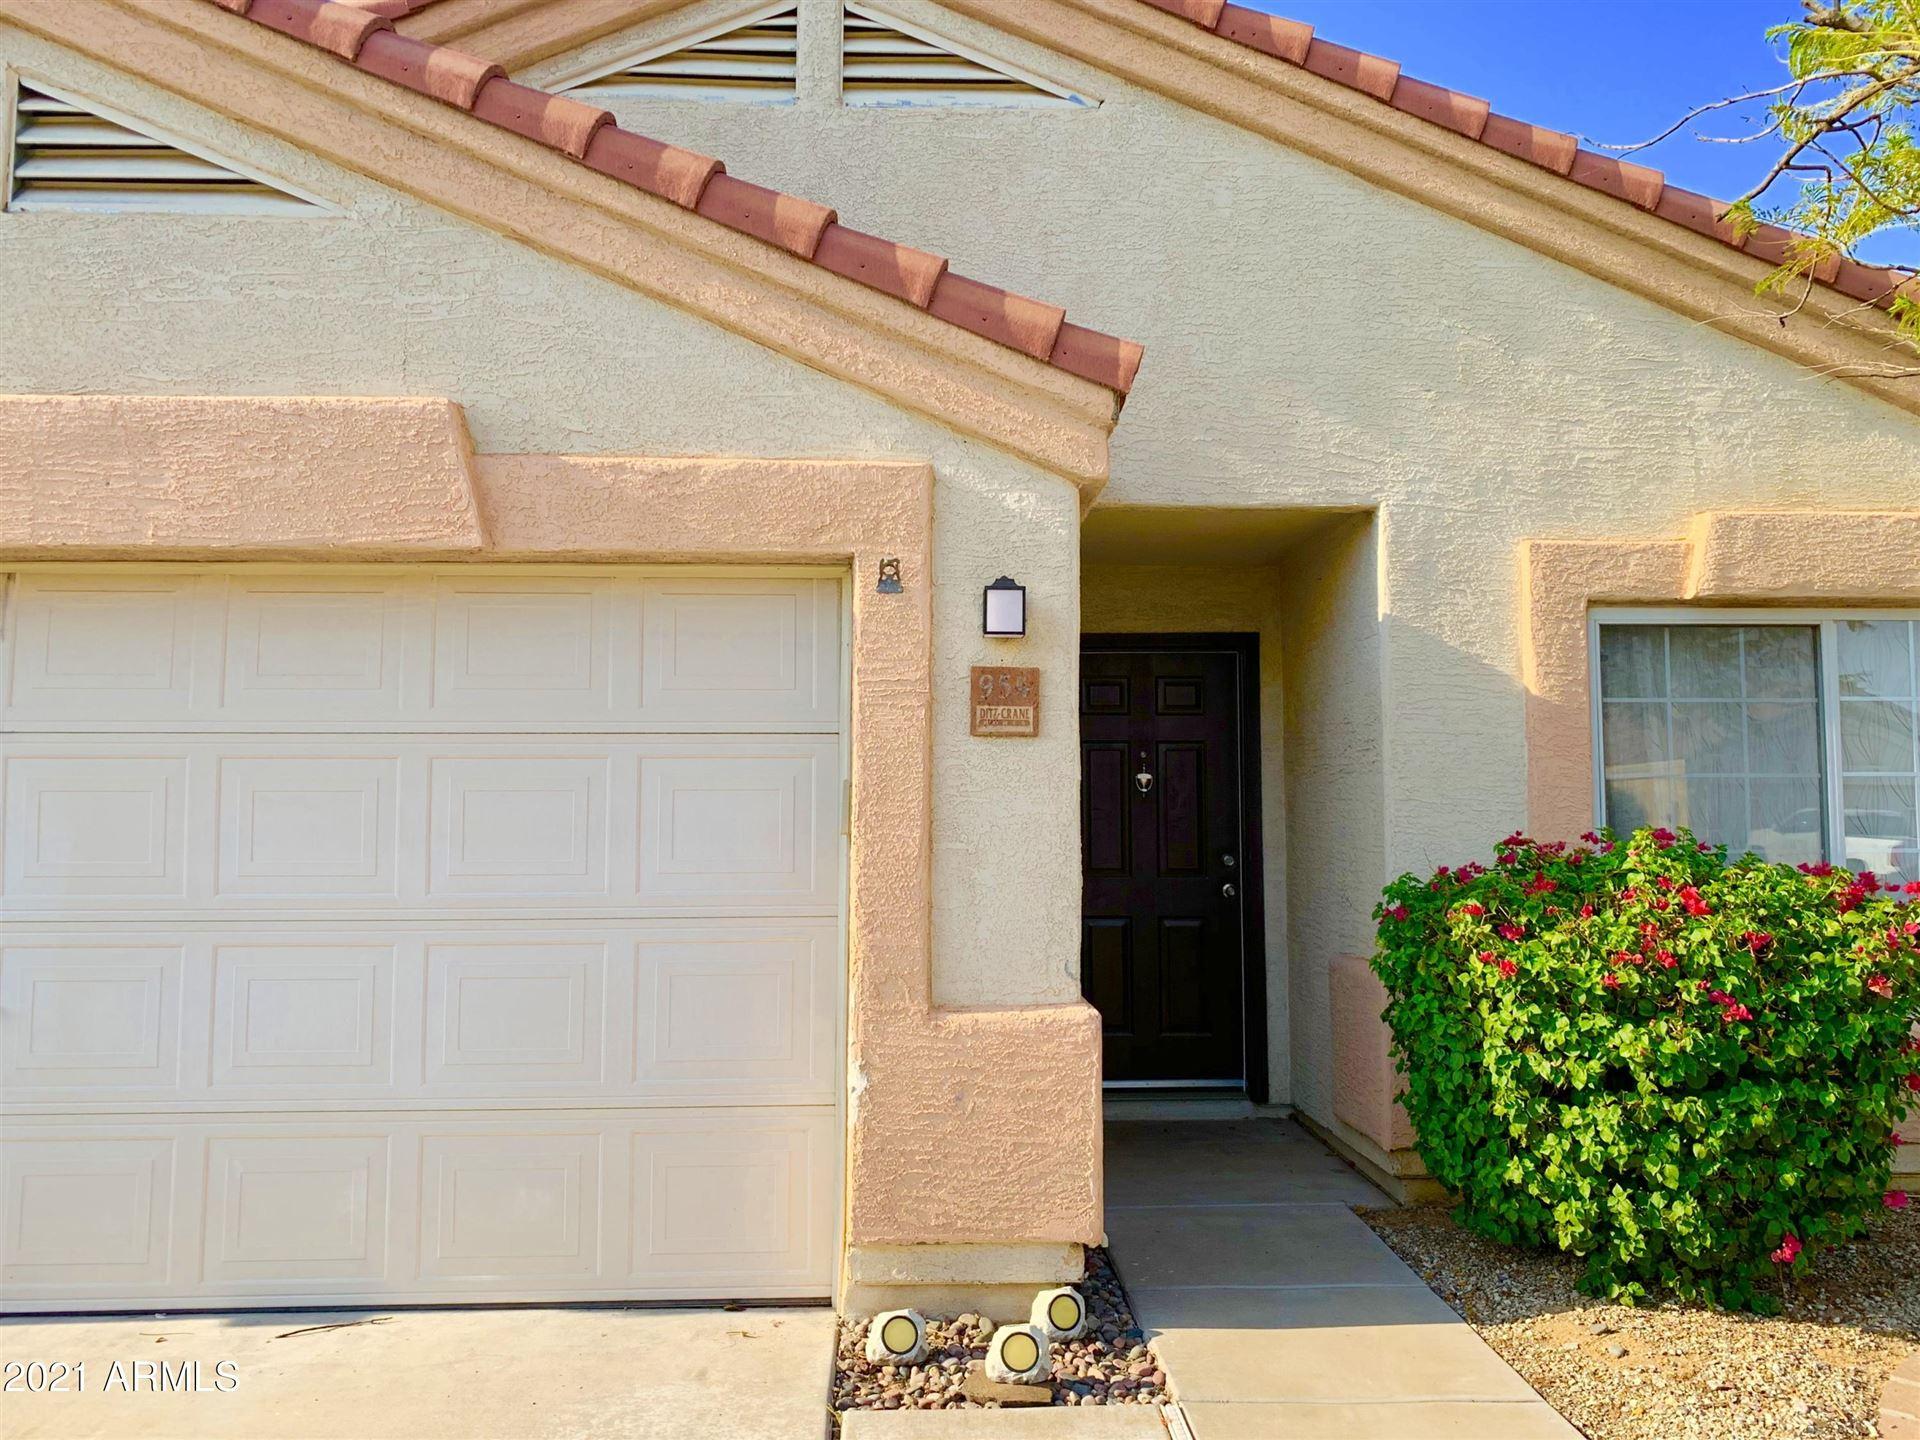 954 E MONTEREY Street, Chandler, AZ 85225 - MLS#: 6233866